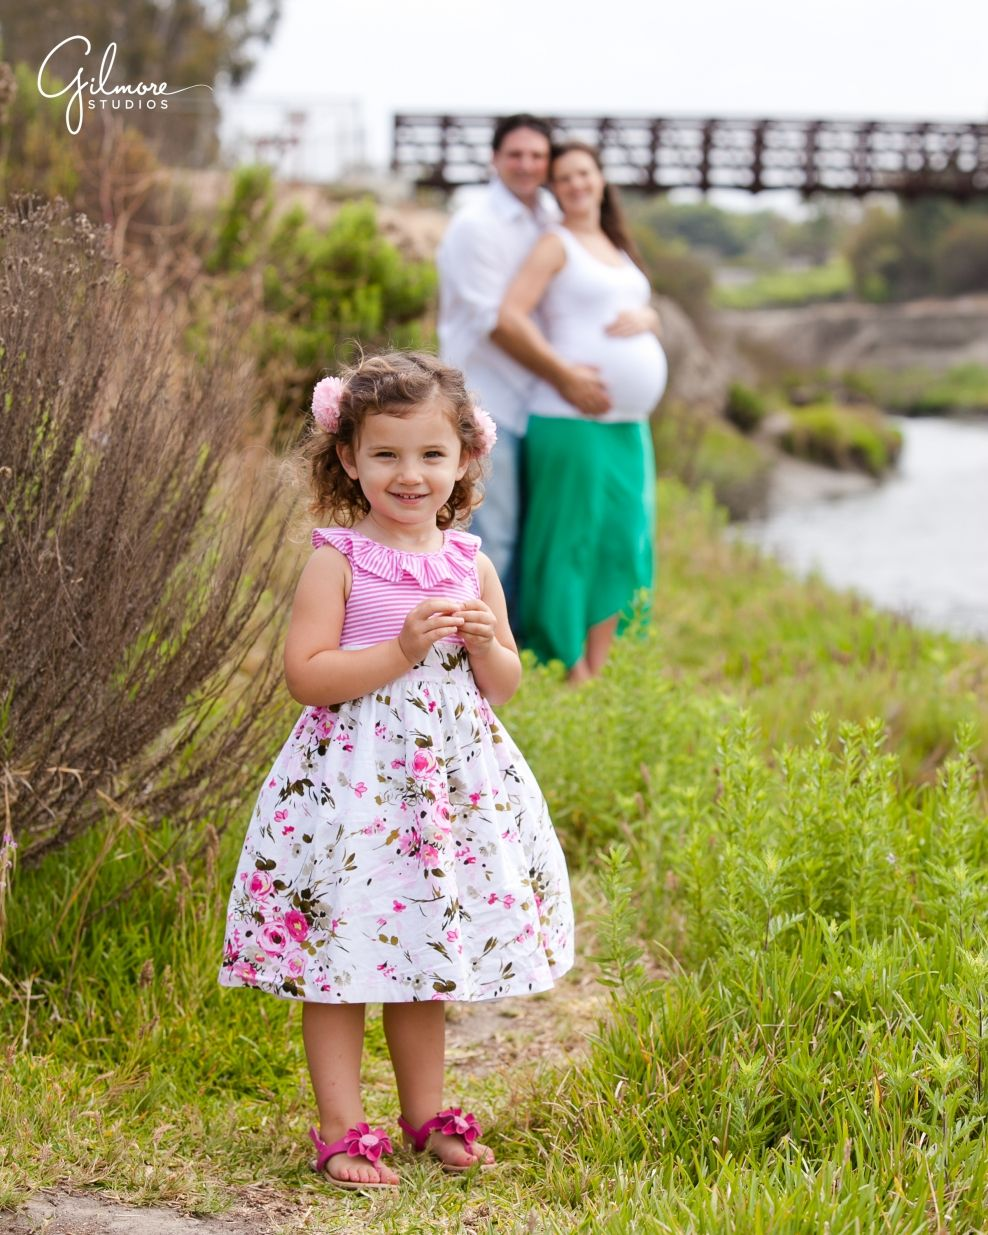 9384cd678e Newport Beach Maternity Portrait Session ~ in the outdoors » Gilmore Studios  ~ Newport Beach Wedding, Newborn, and Family Portrait Photographers in  Orange ...